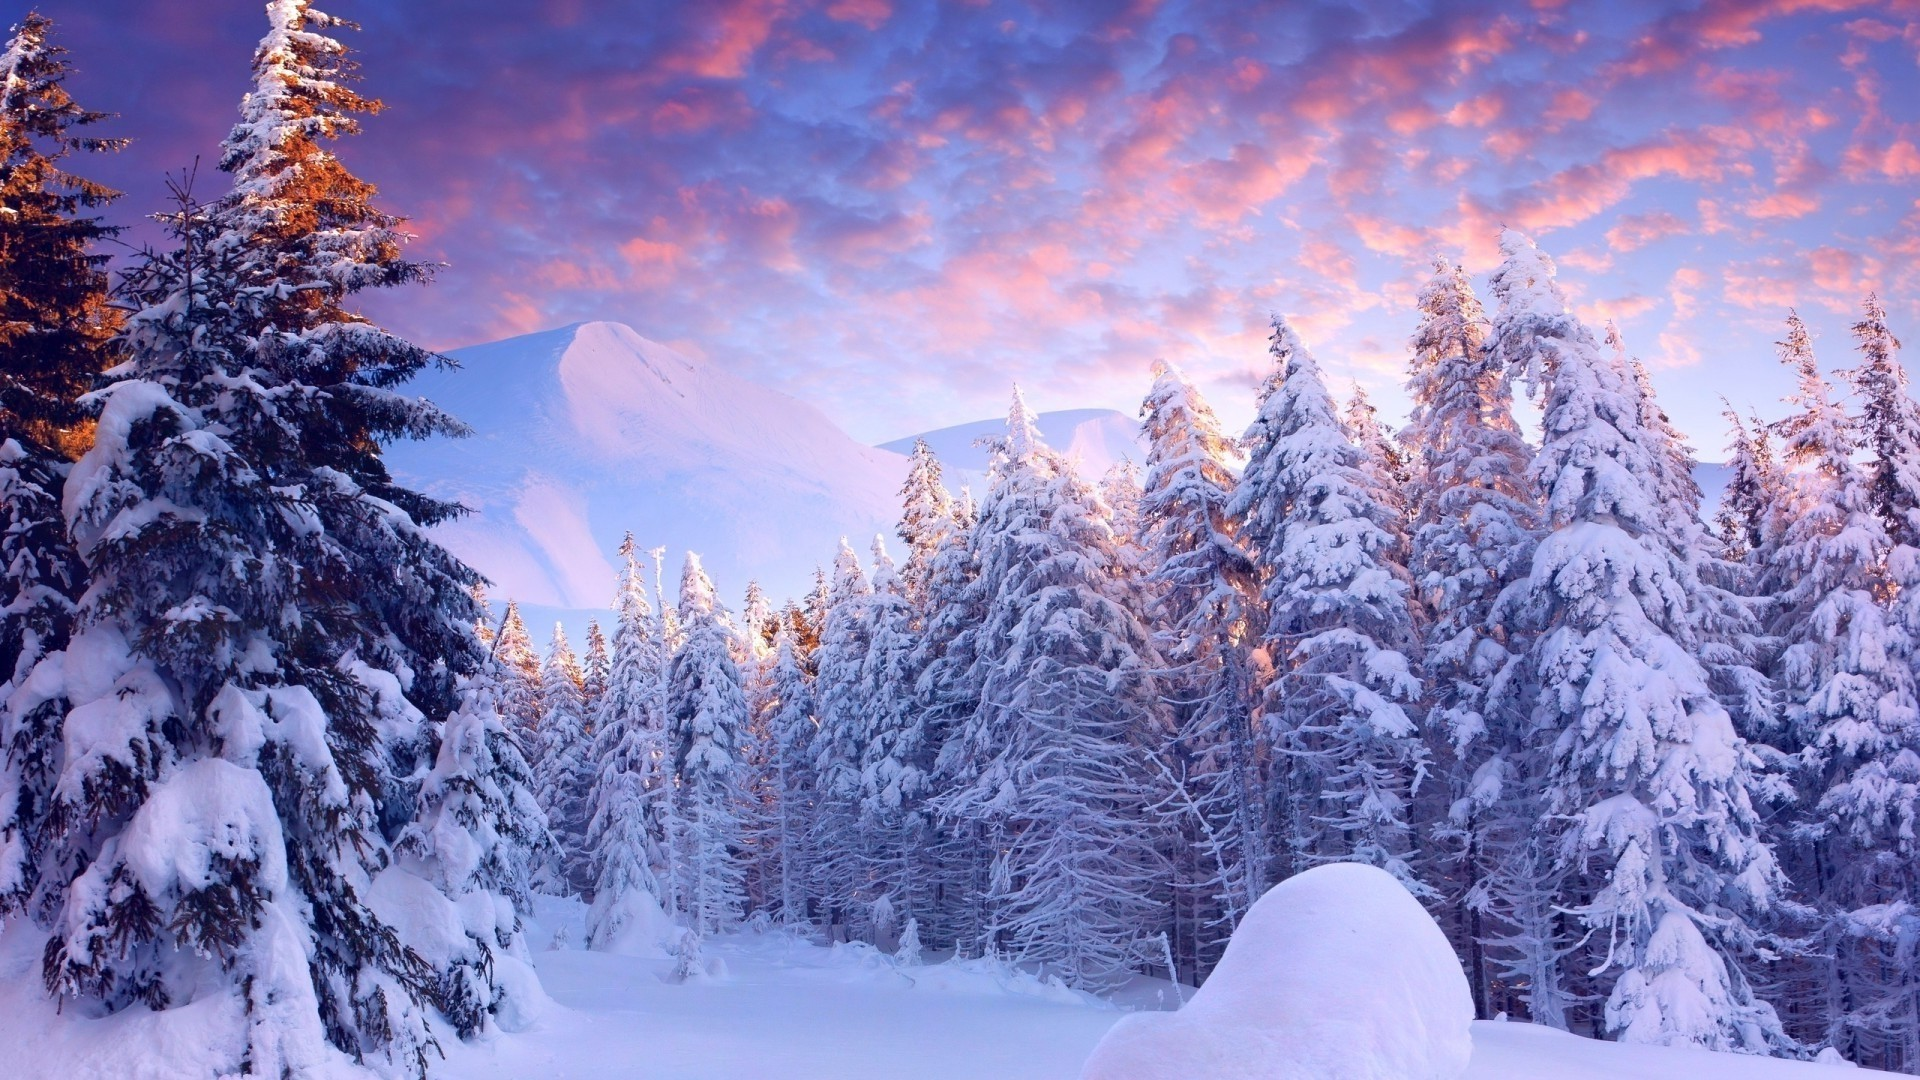 Winter Wonderland Wallpaper image hd